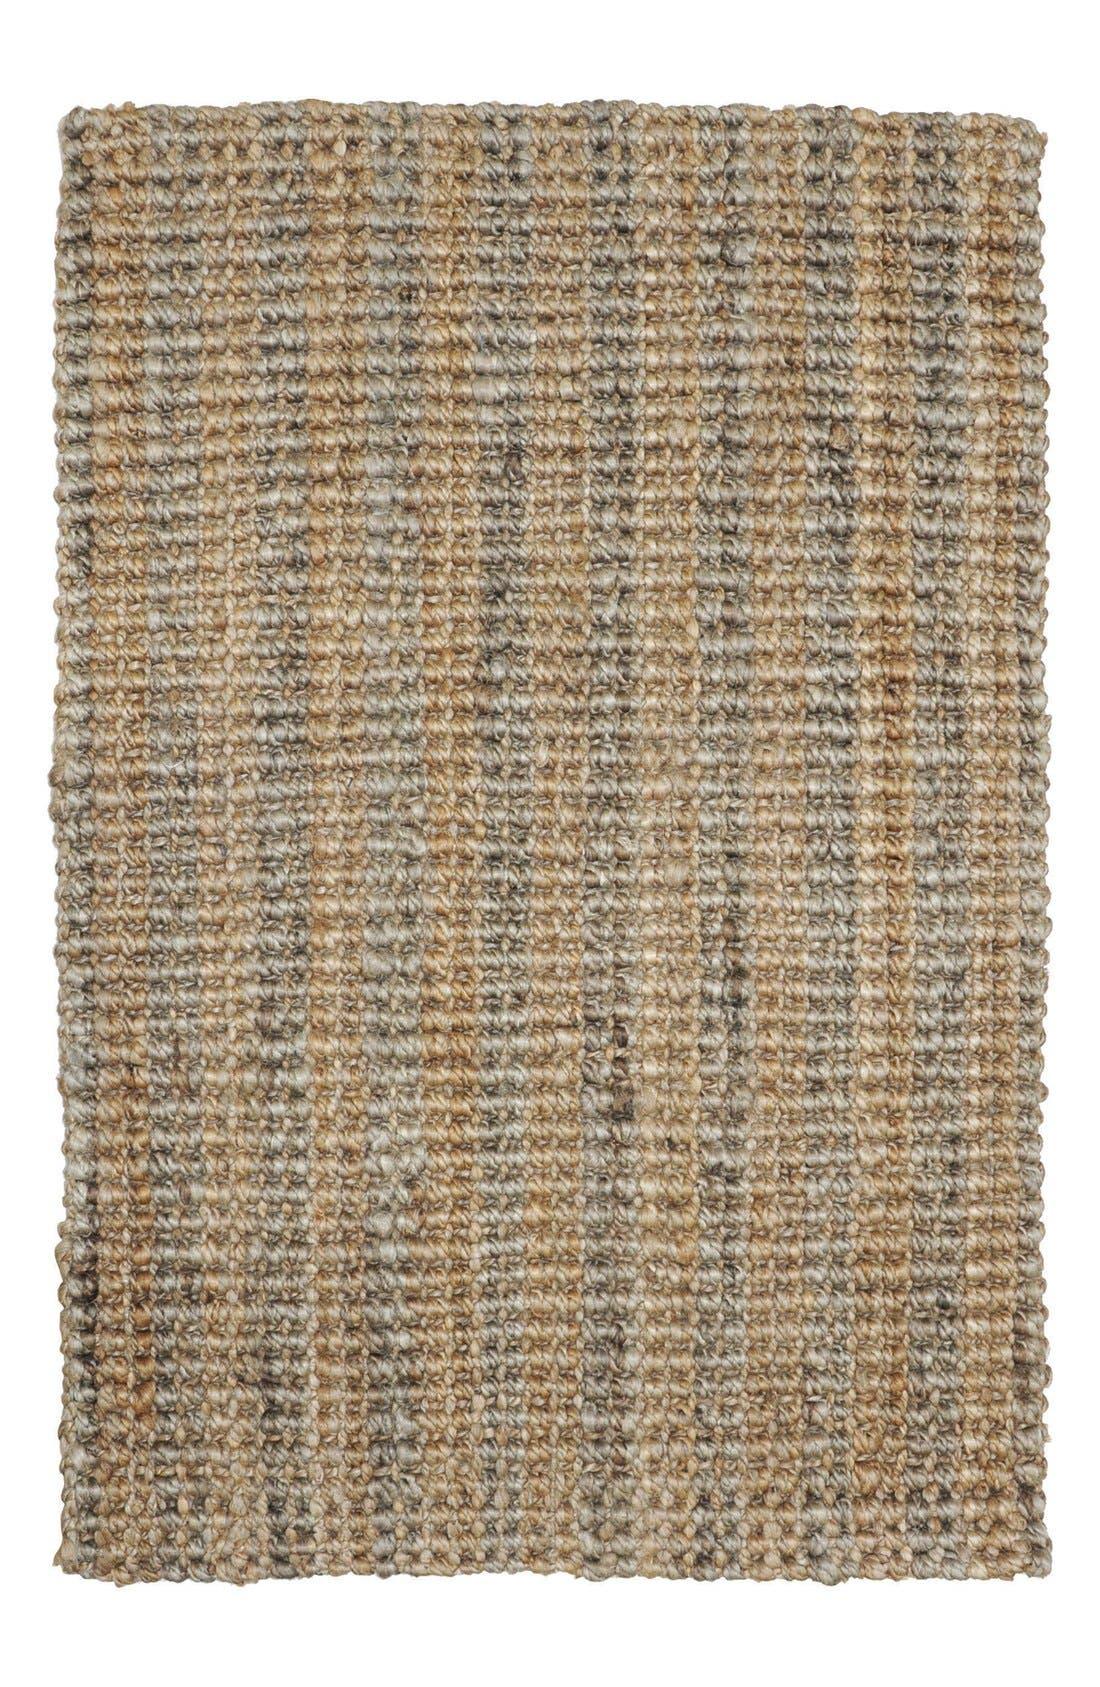 Bouclé Handwoven Rug,                         Main,                         color, Natural/ Grey